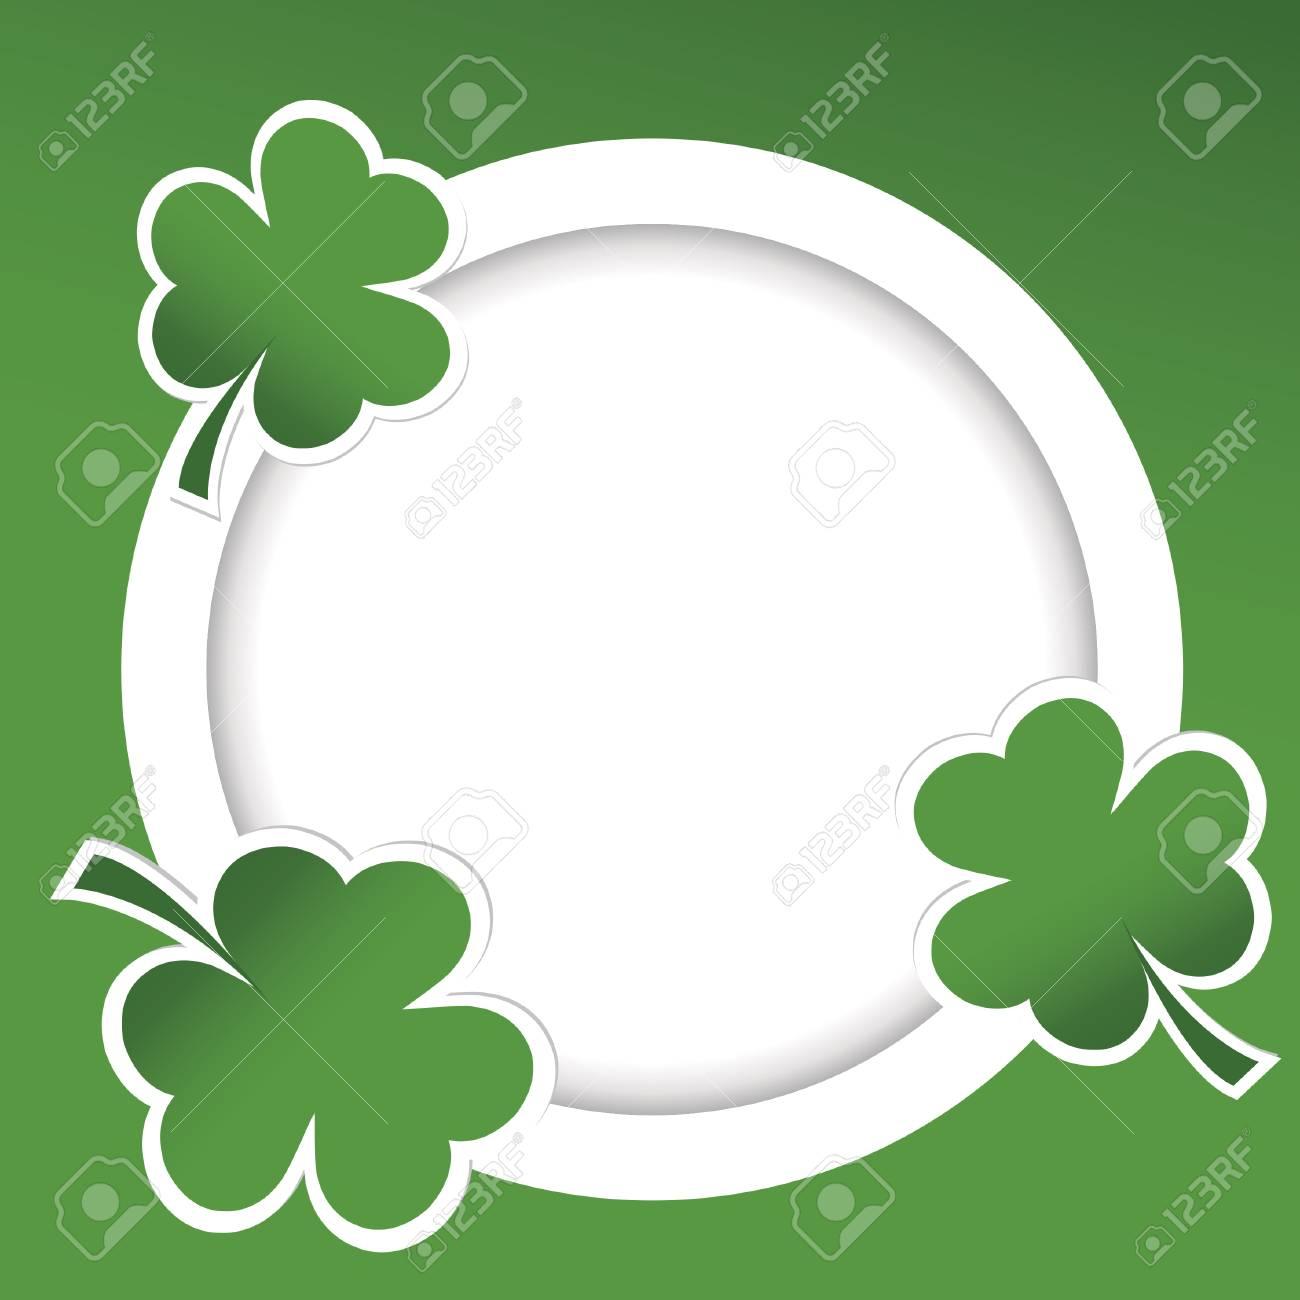 Shamrock illustration card for St. Patrick's Day Stock Illustration - 23267049